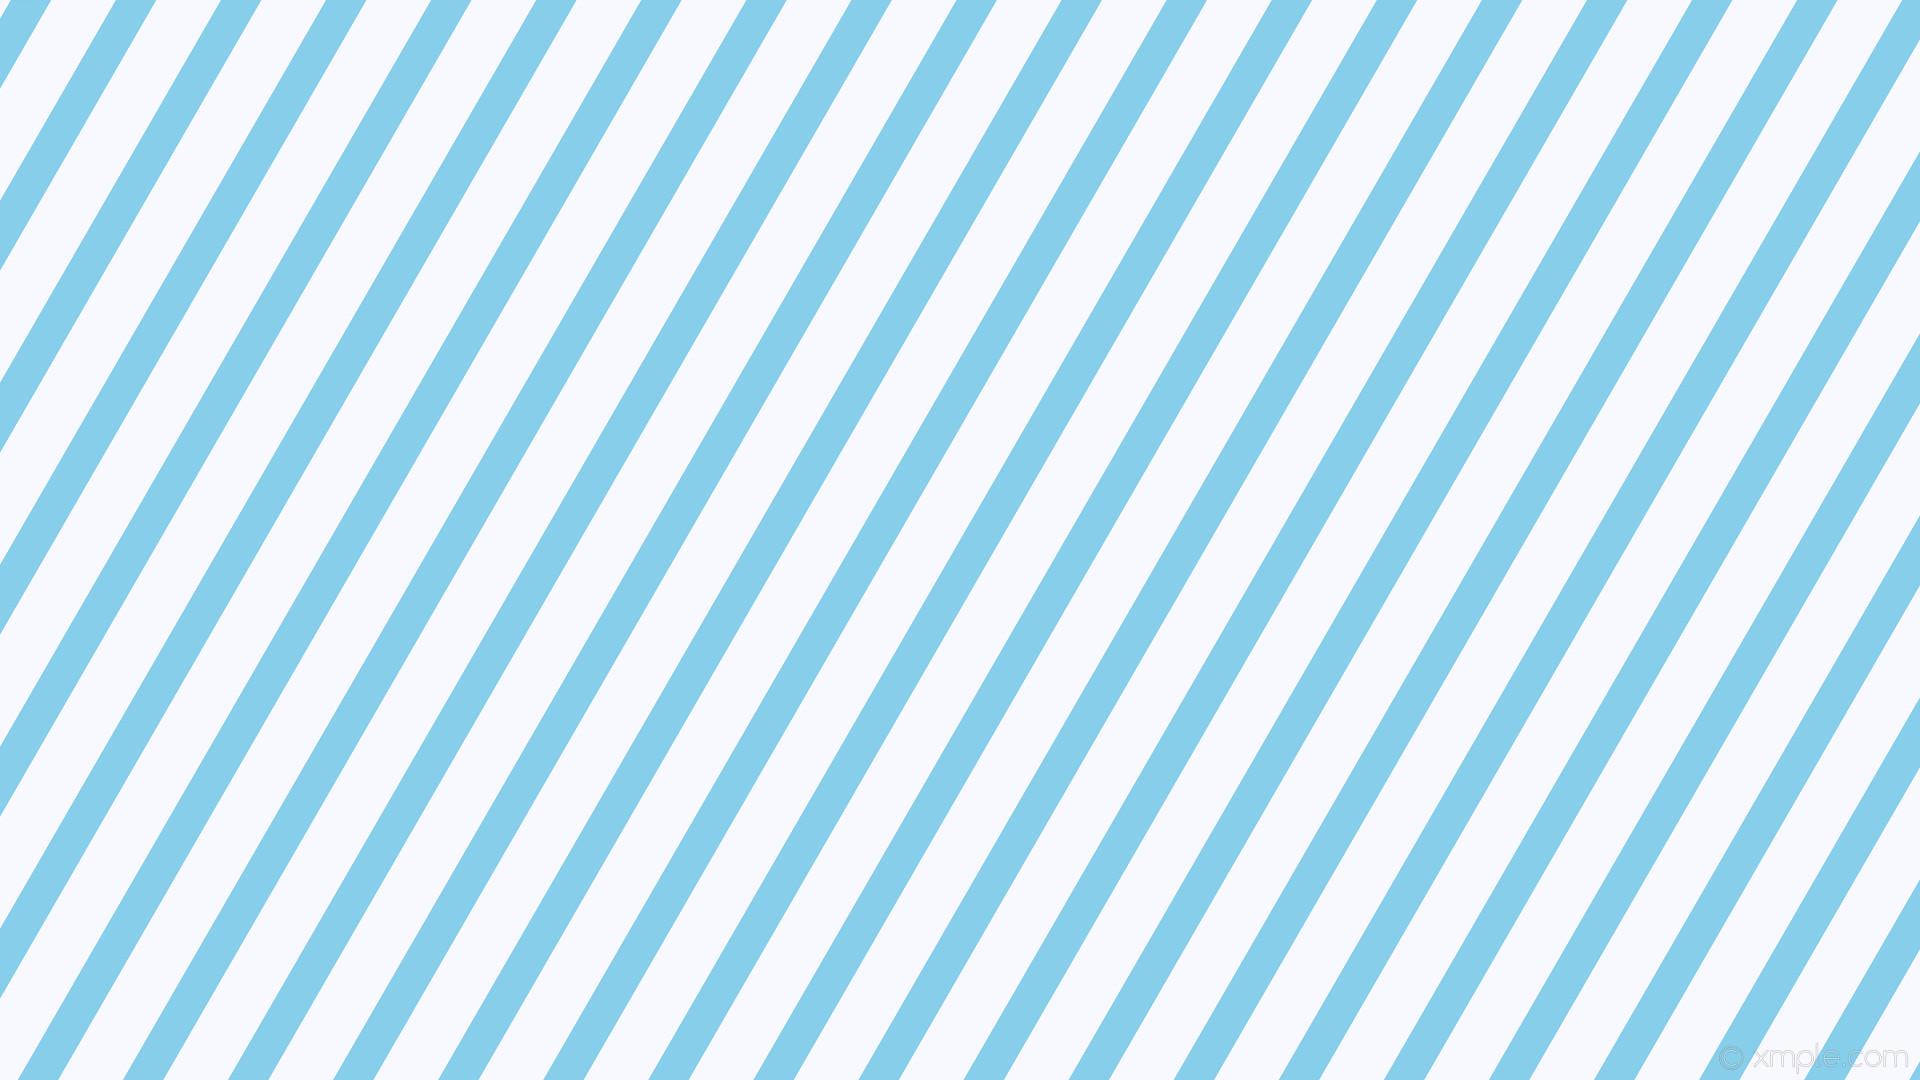 wallpaper stripes lines streaks white blue sky blue ghost white #87ceeb  #f8f8ff diagonal 60